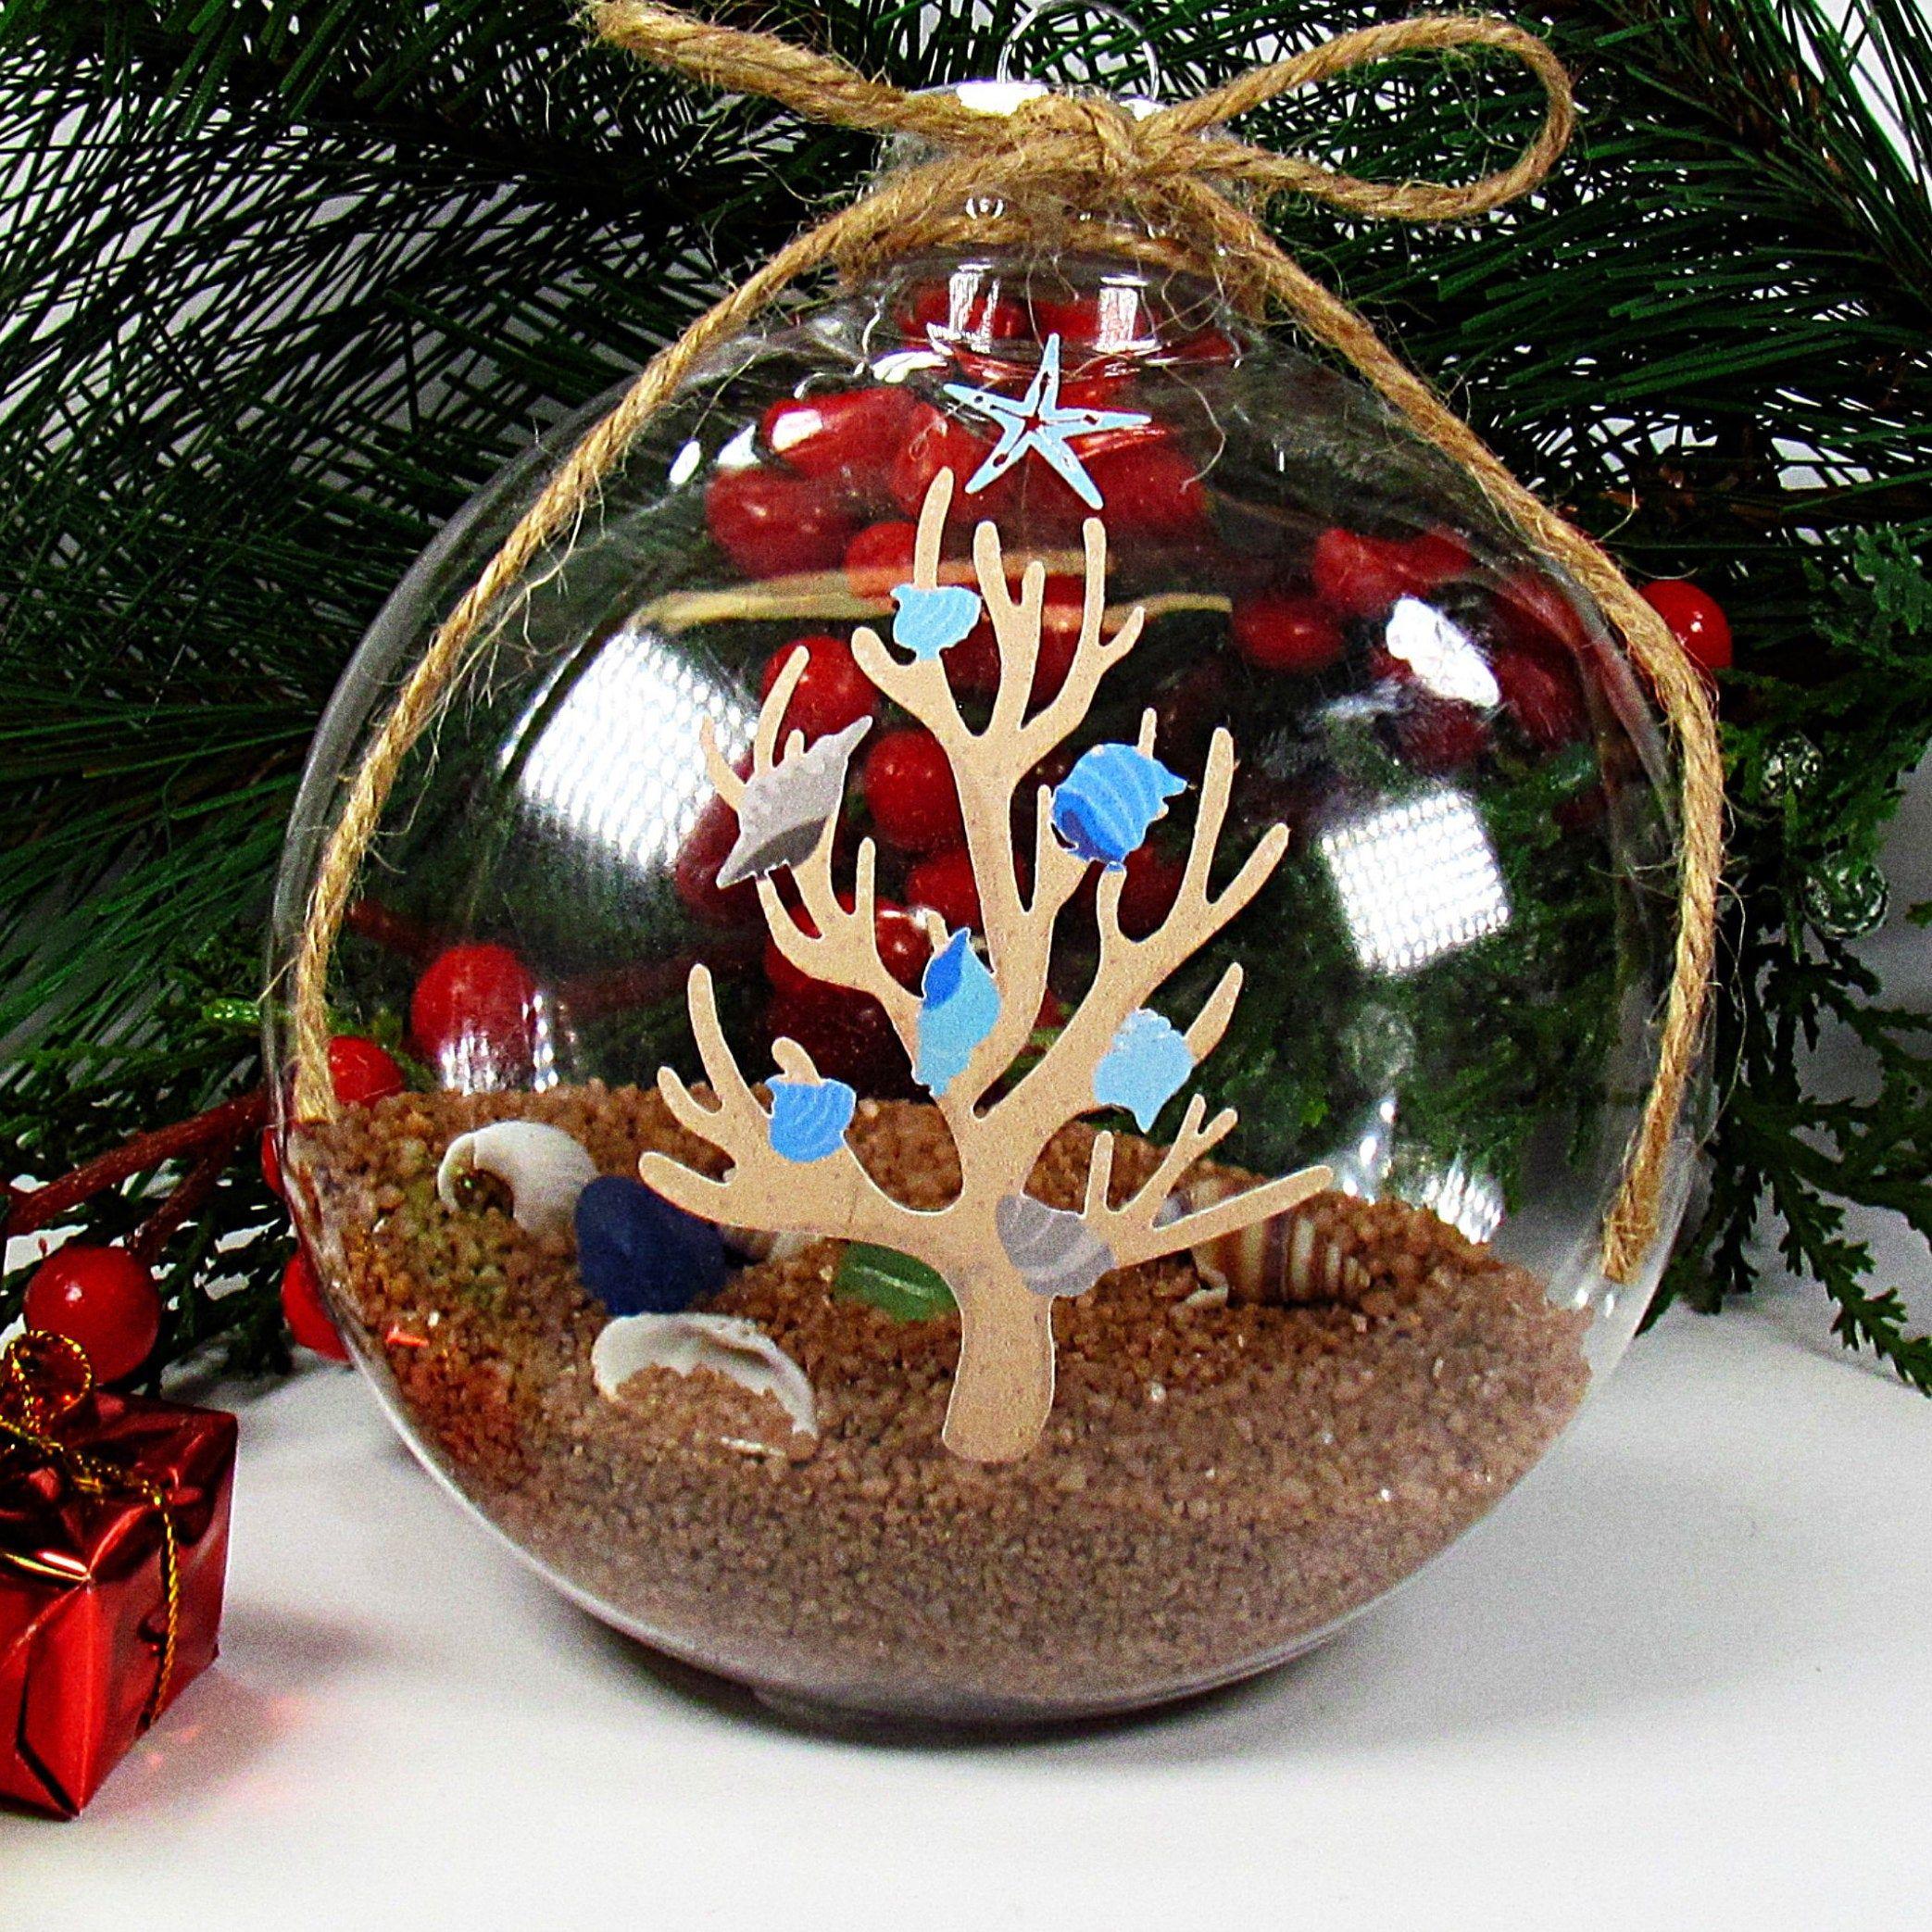 Personalized Coastal Decor Shatterproof Christmas Ornament Etsy In 2020 Coastal Christmas Tree Christmas Ornaments Christmas Tree Themes